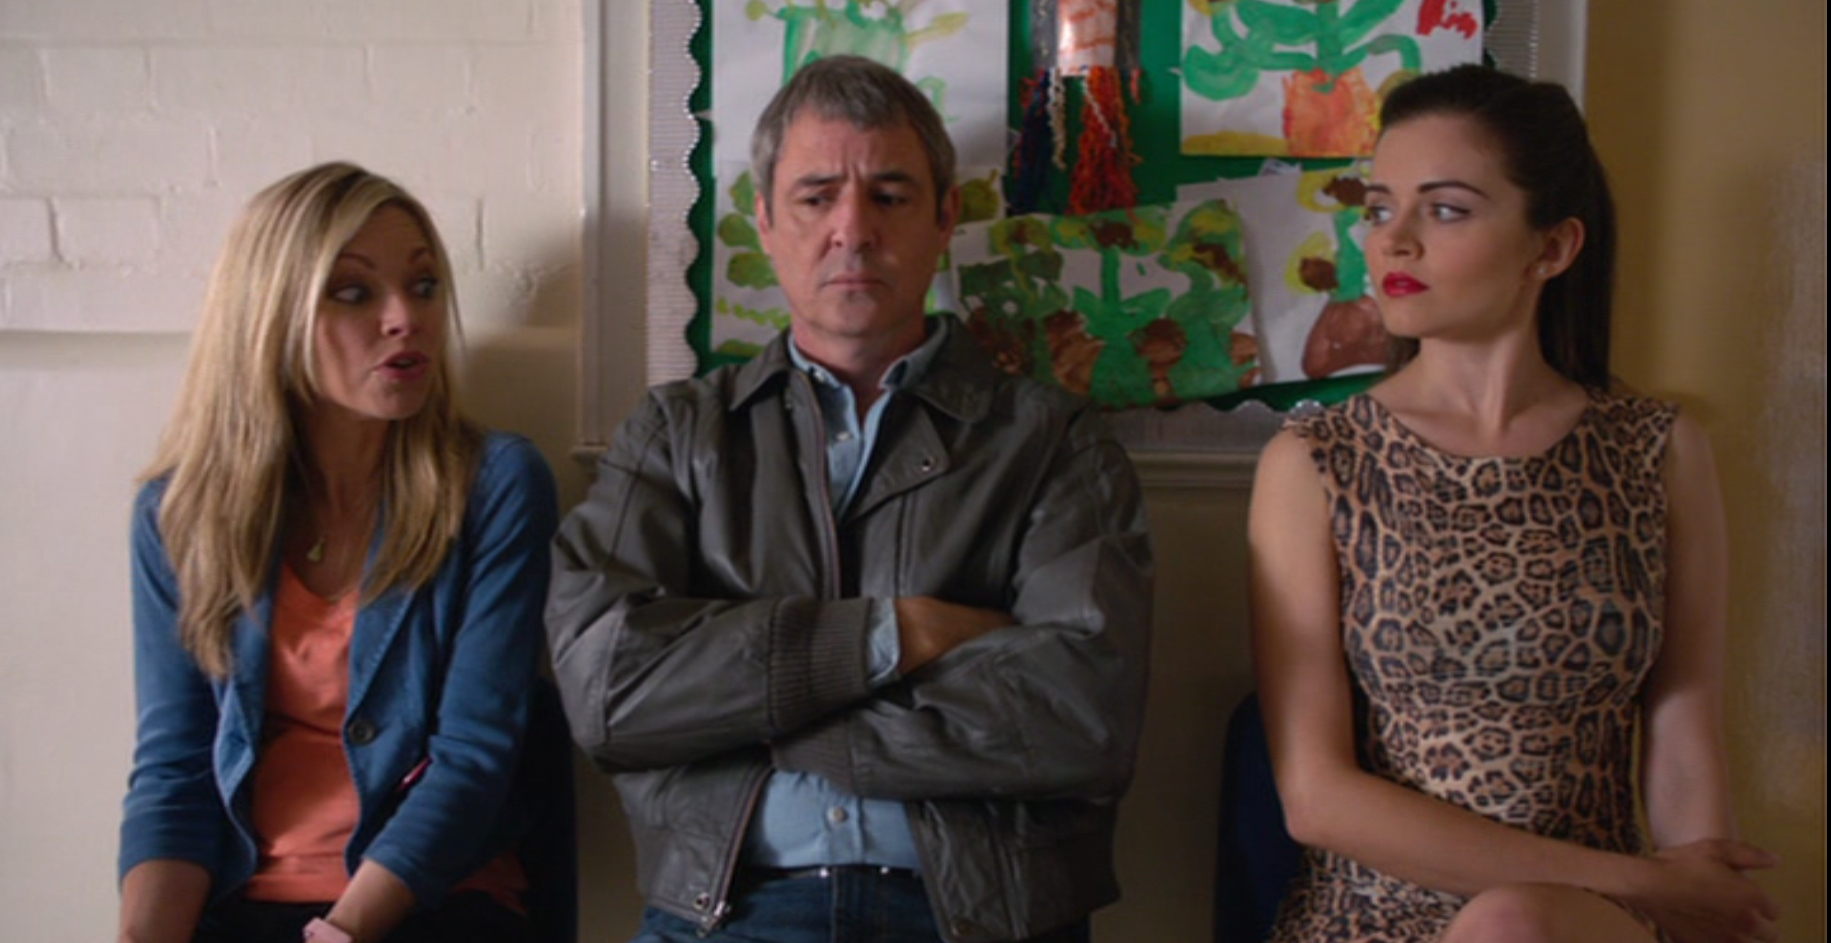 Sarah Alexander, Neil Morrissey and Vera Filatova in 'Me and Mrs Jones'.